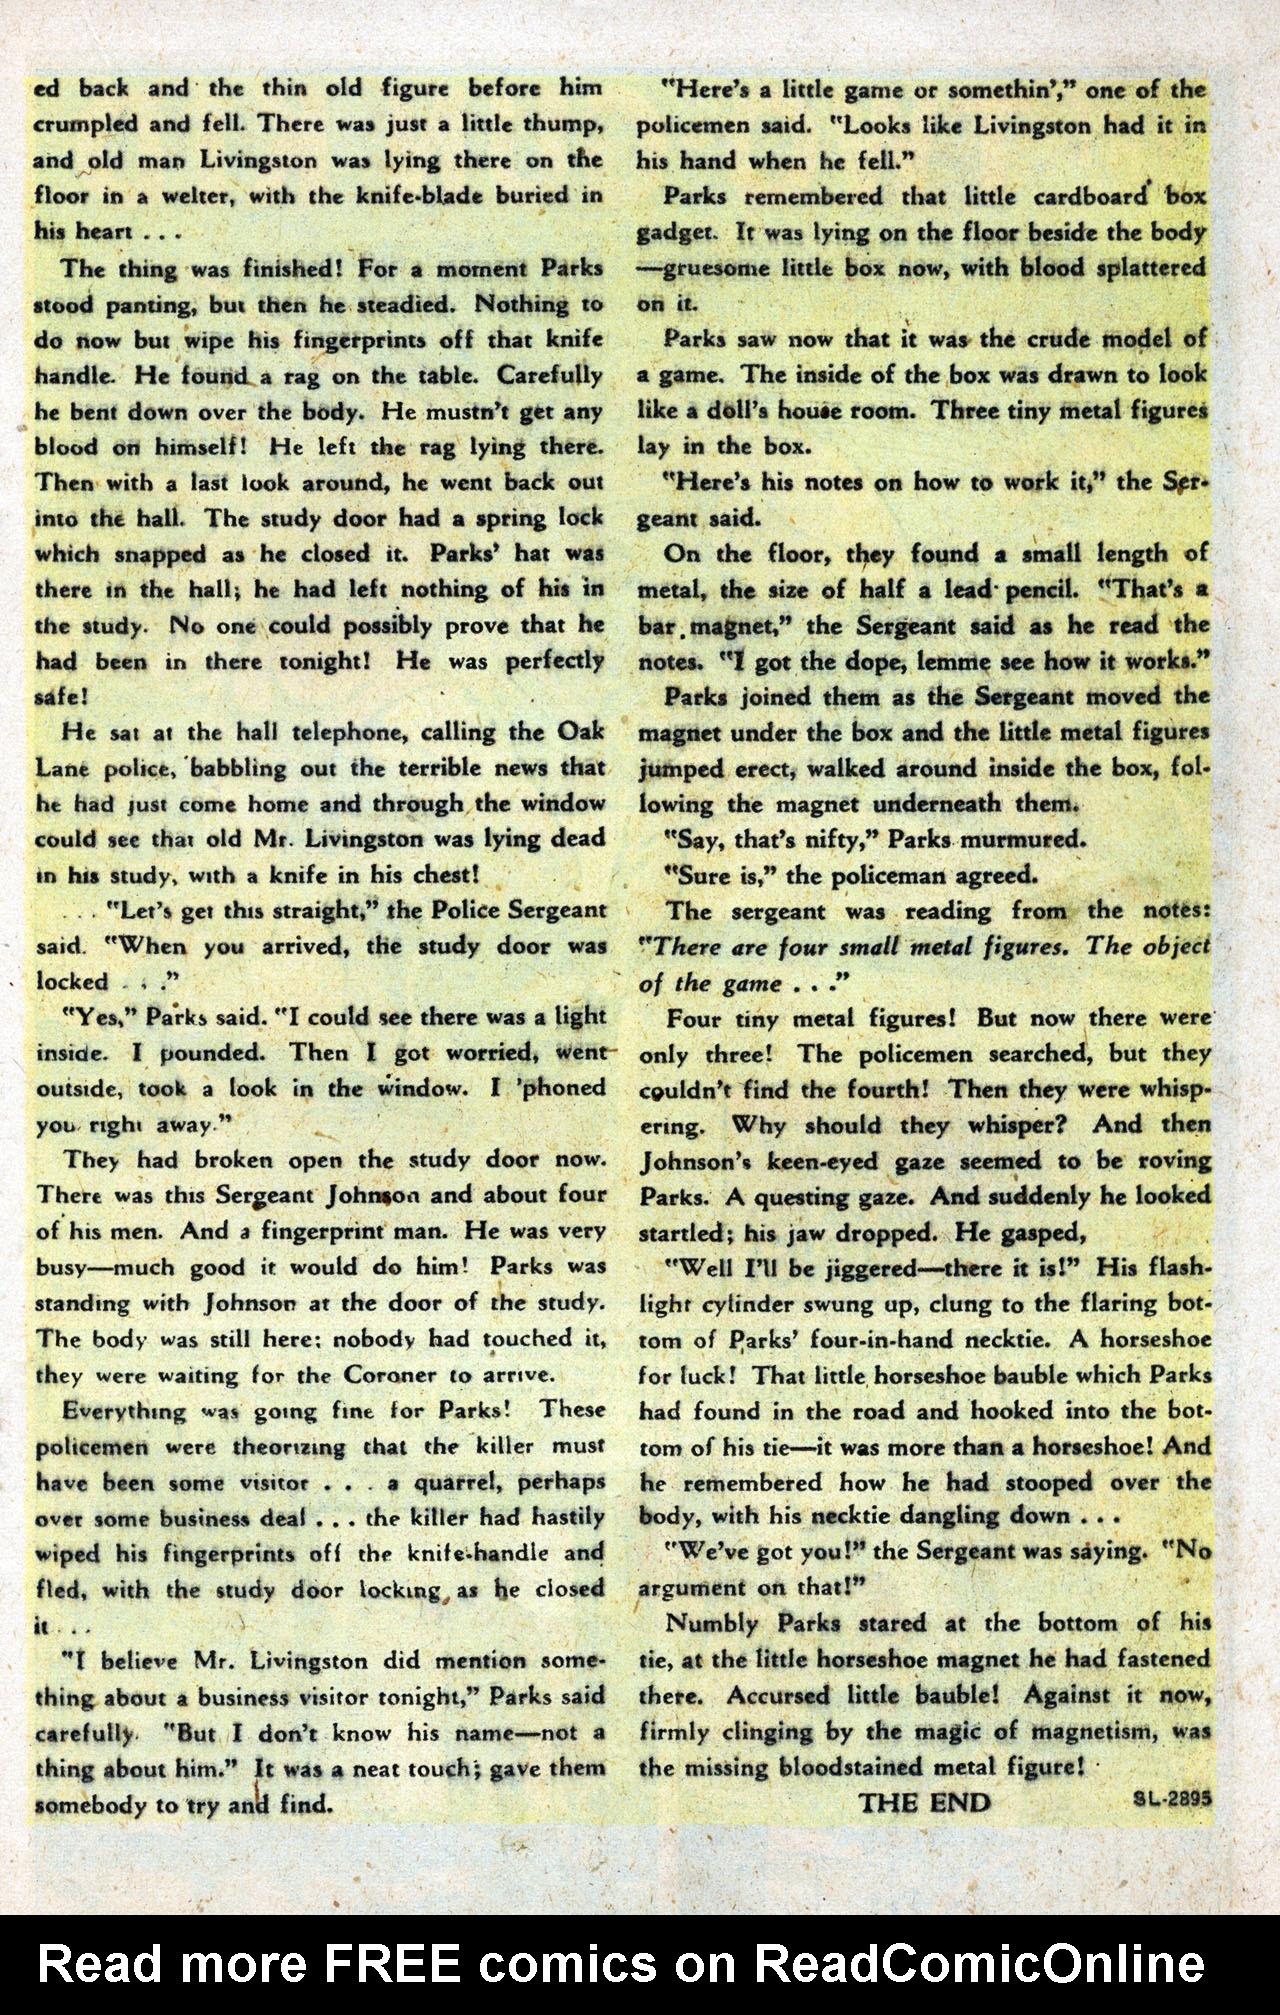 Read online Two-Gun Kid comic -  Issue #3 - 21